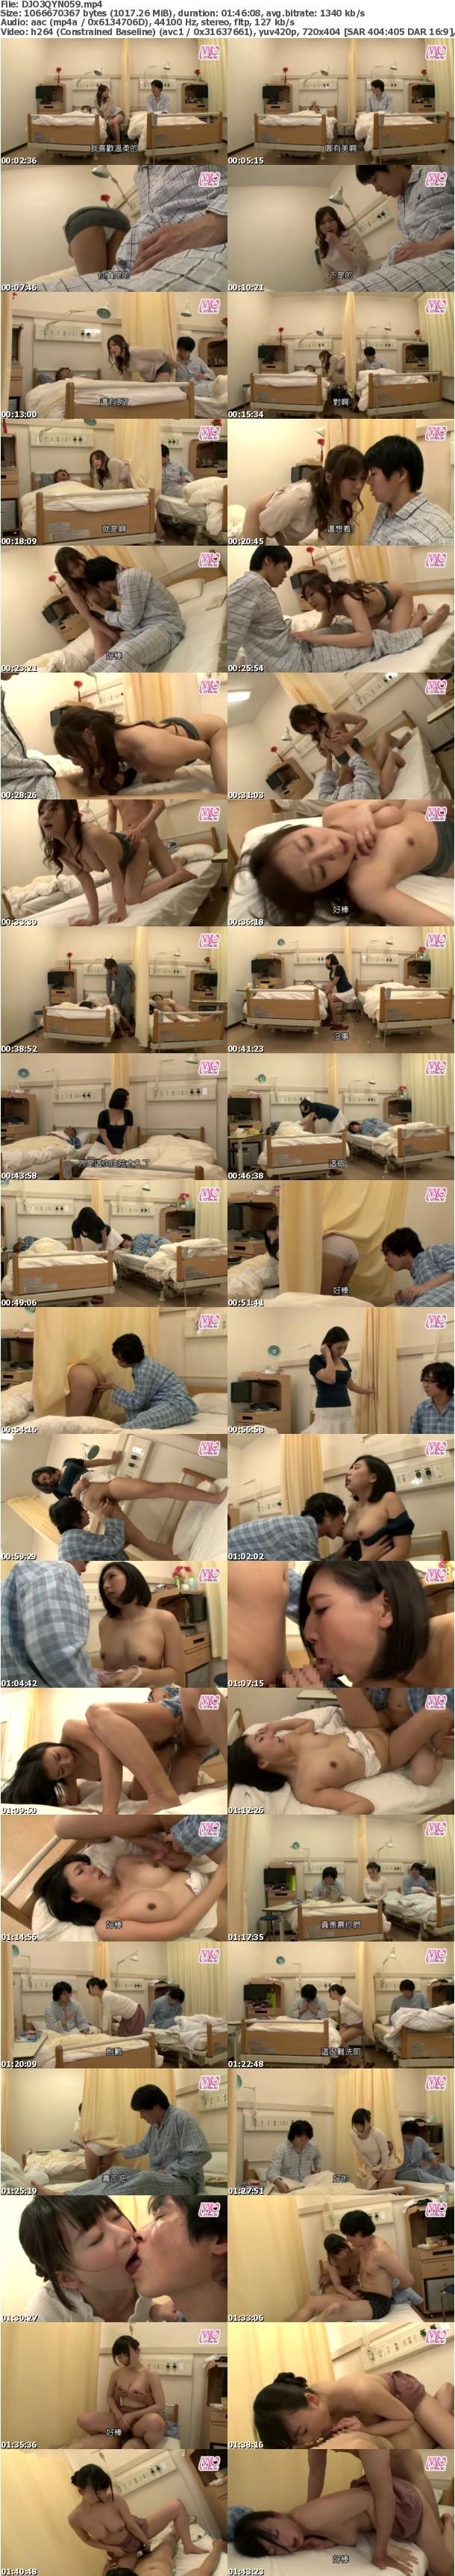 [GS-059] 對來看丈夫的誘人少婦勃起!她也瞞著丈夫給我手淫,結果我活力百倍忘掉病魔拼死抽插了。[中文字幕]